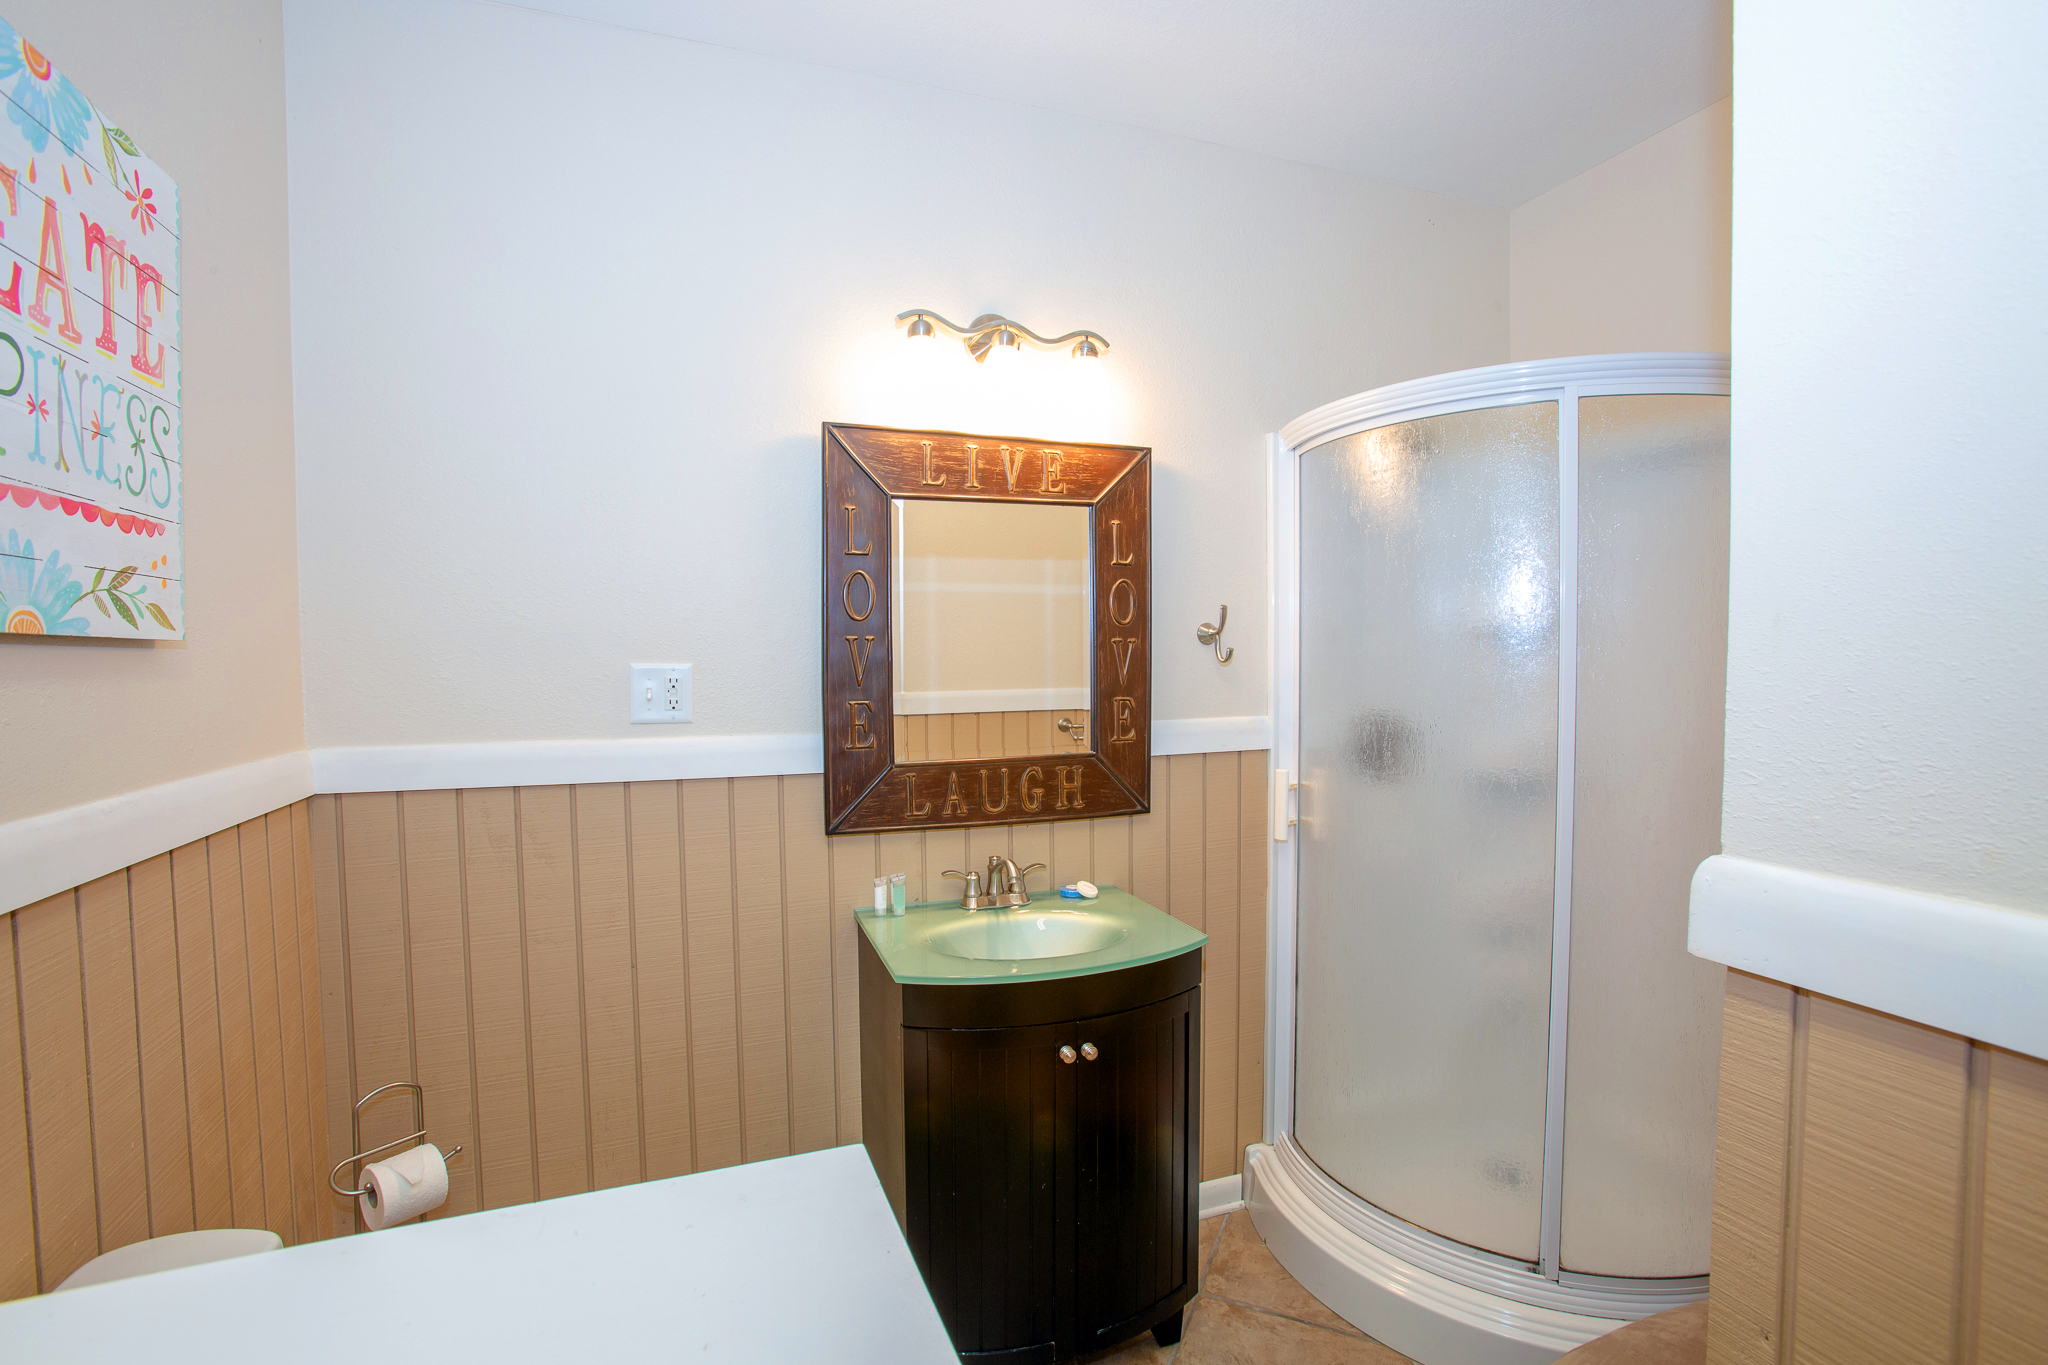 Maldonado 1015 - Sea the Big Picture House/Cottage rental in Pensacola Beach House Rentals in Pensacola Beach Florida - #25